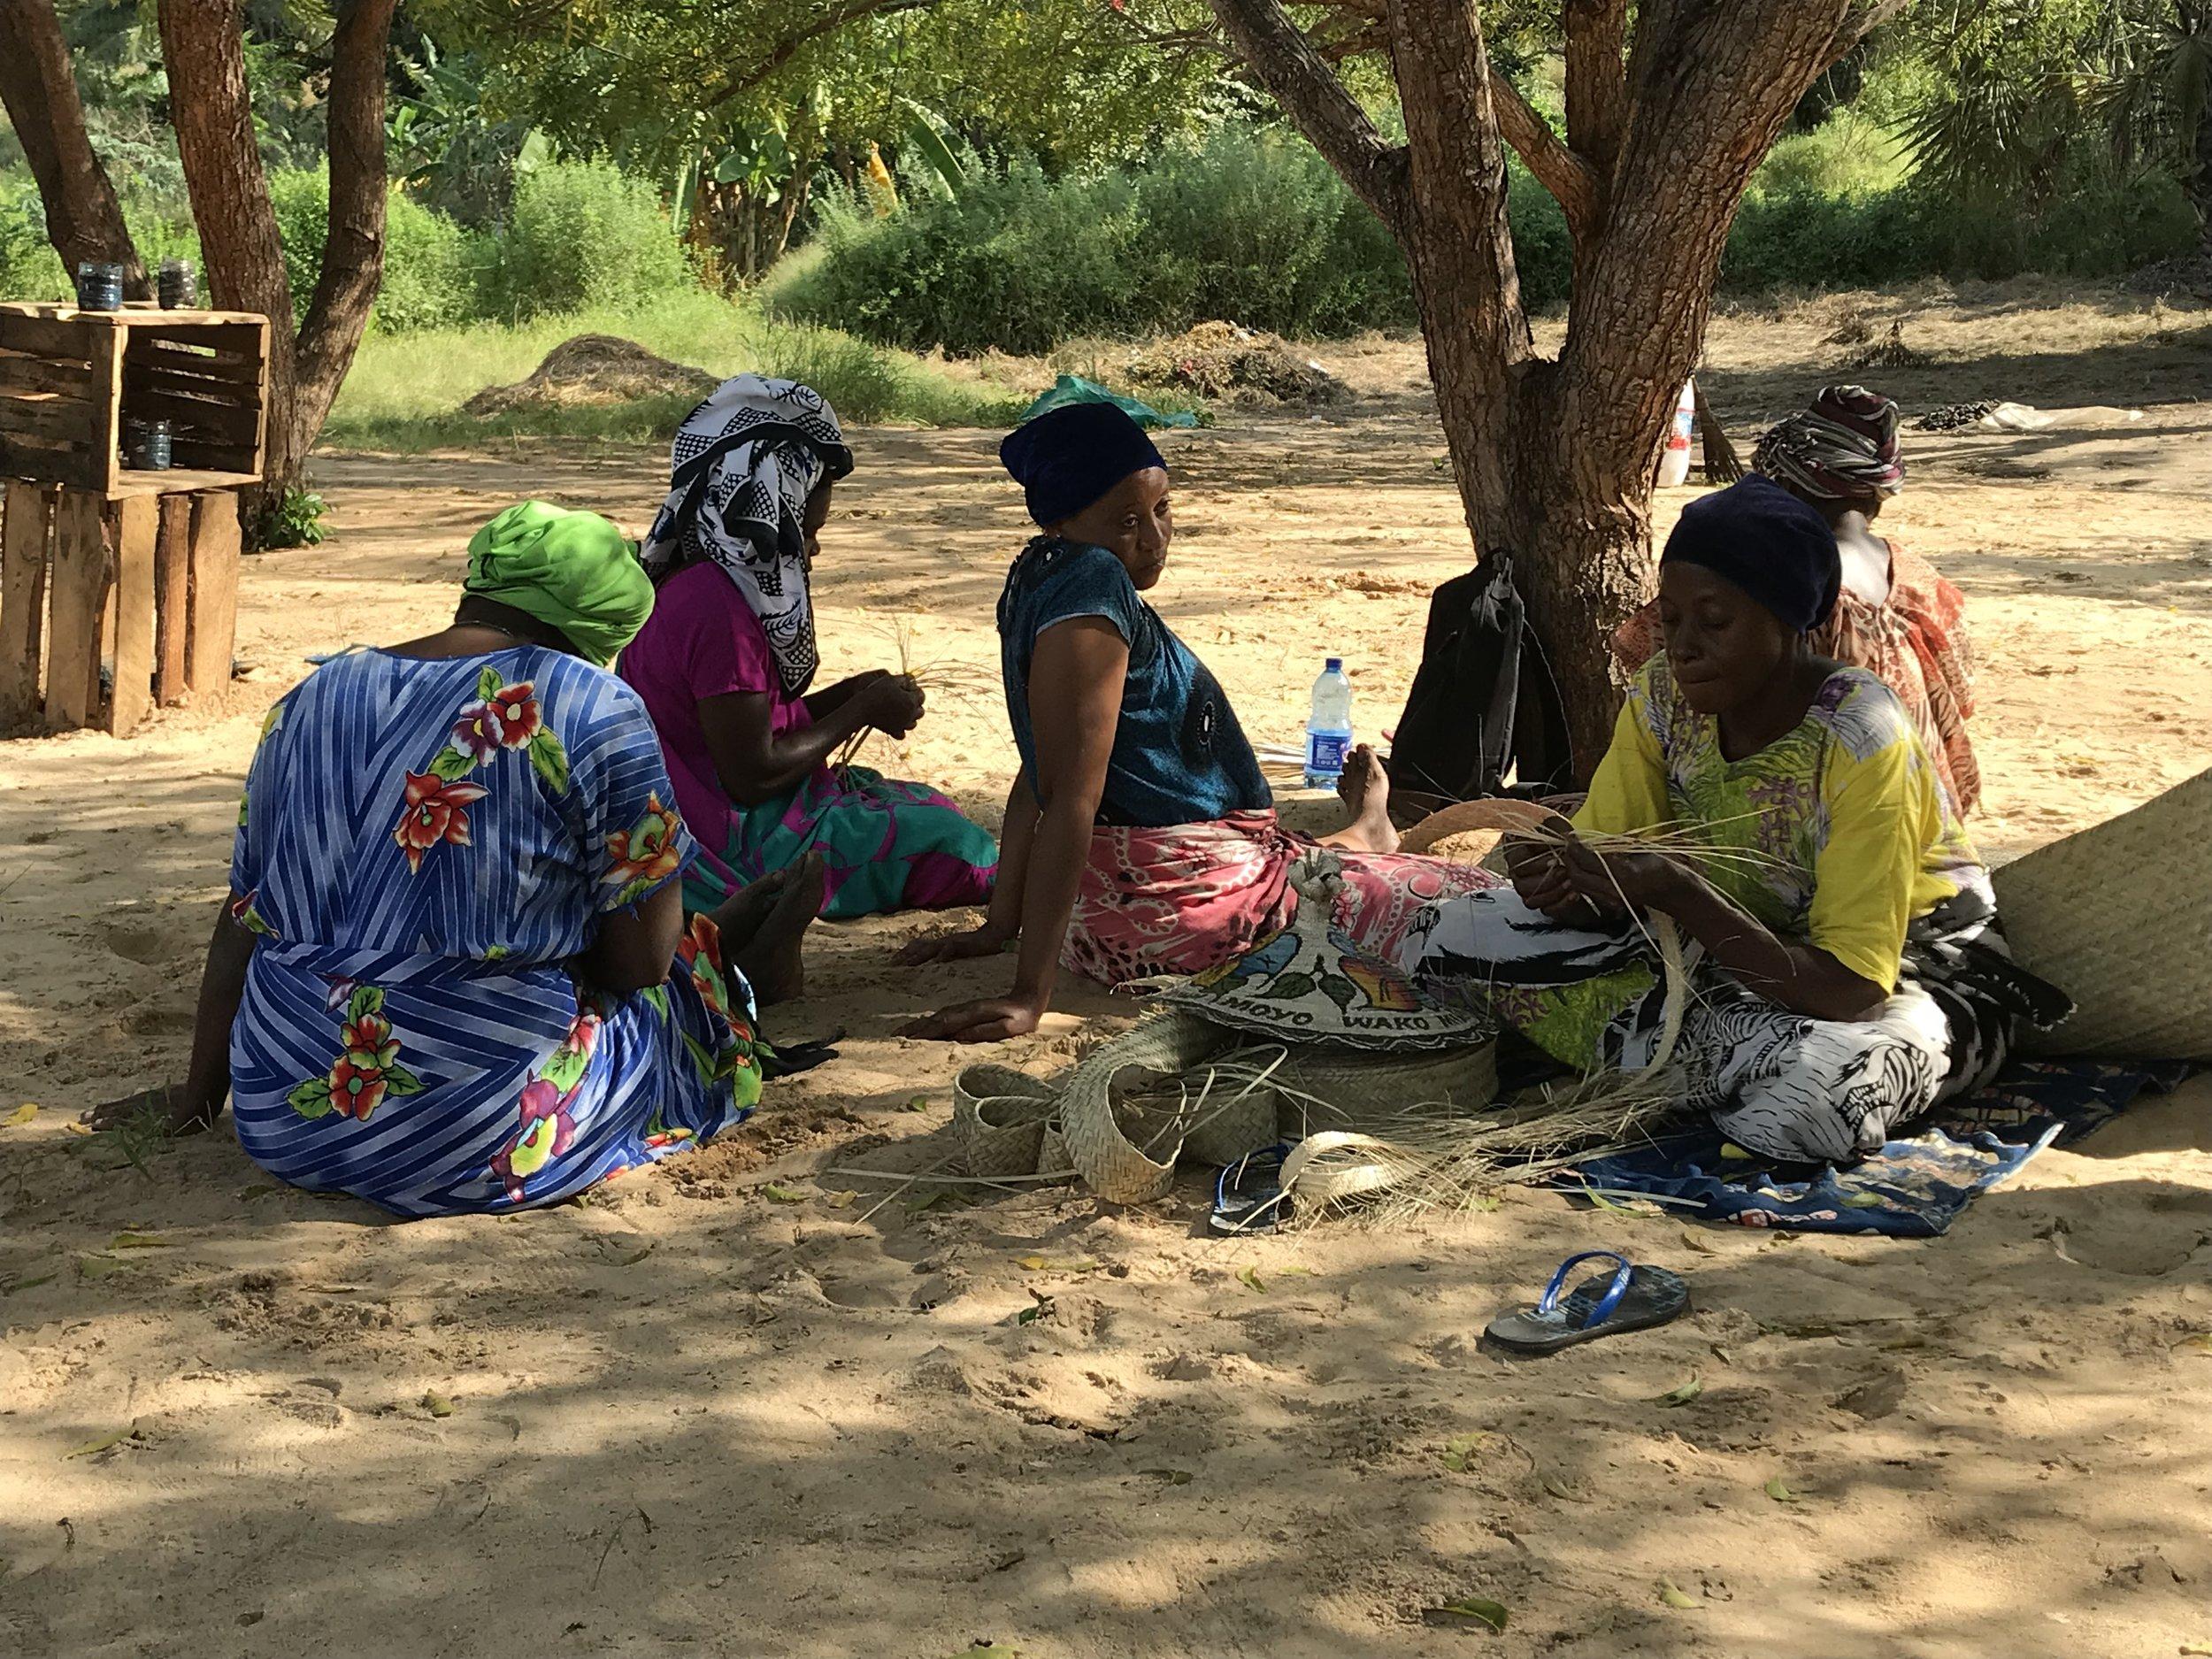 Some_WAUTO_Members_engaging_in_Basket_and_mats_making_at_Kaole_Bagamoyo.jpg